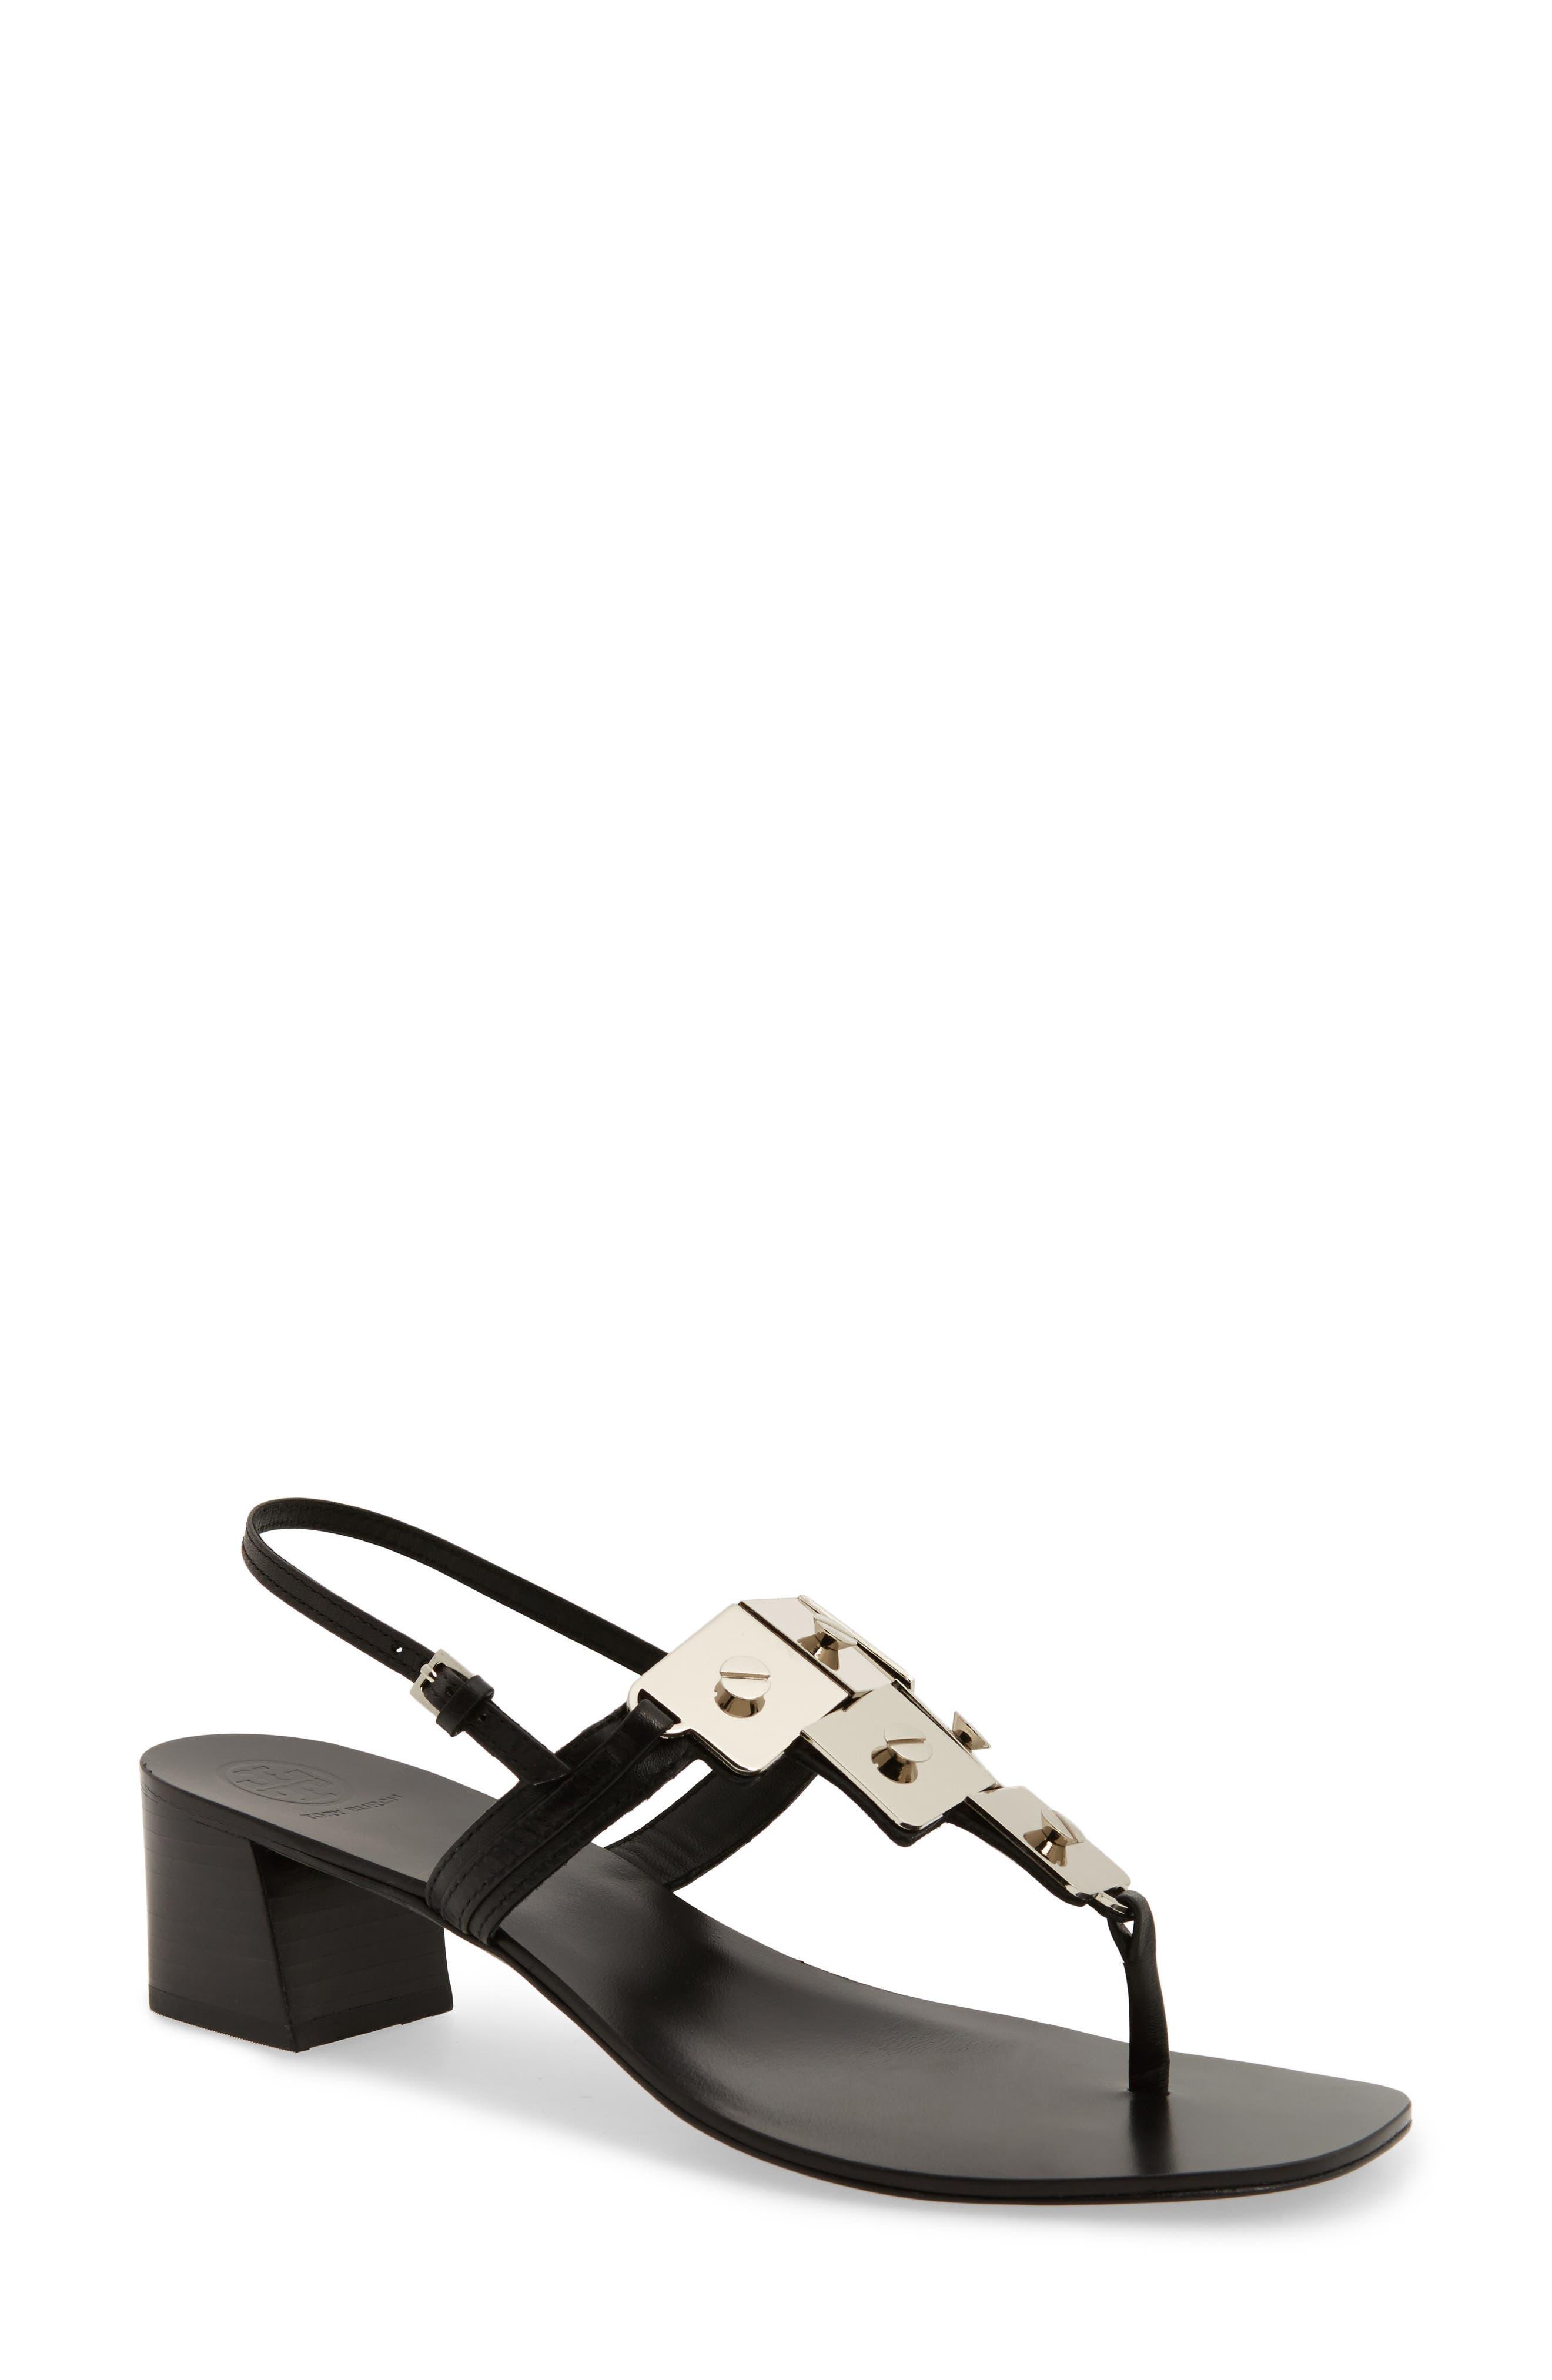 Thompson Sandal,                         Main,                         color, Perfect Black